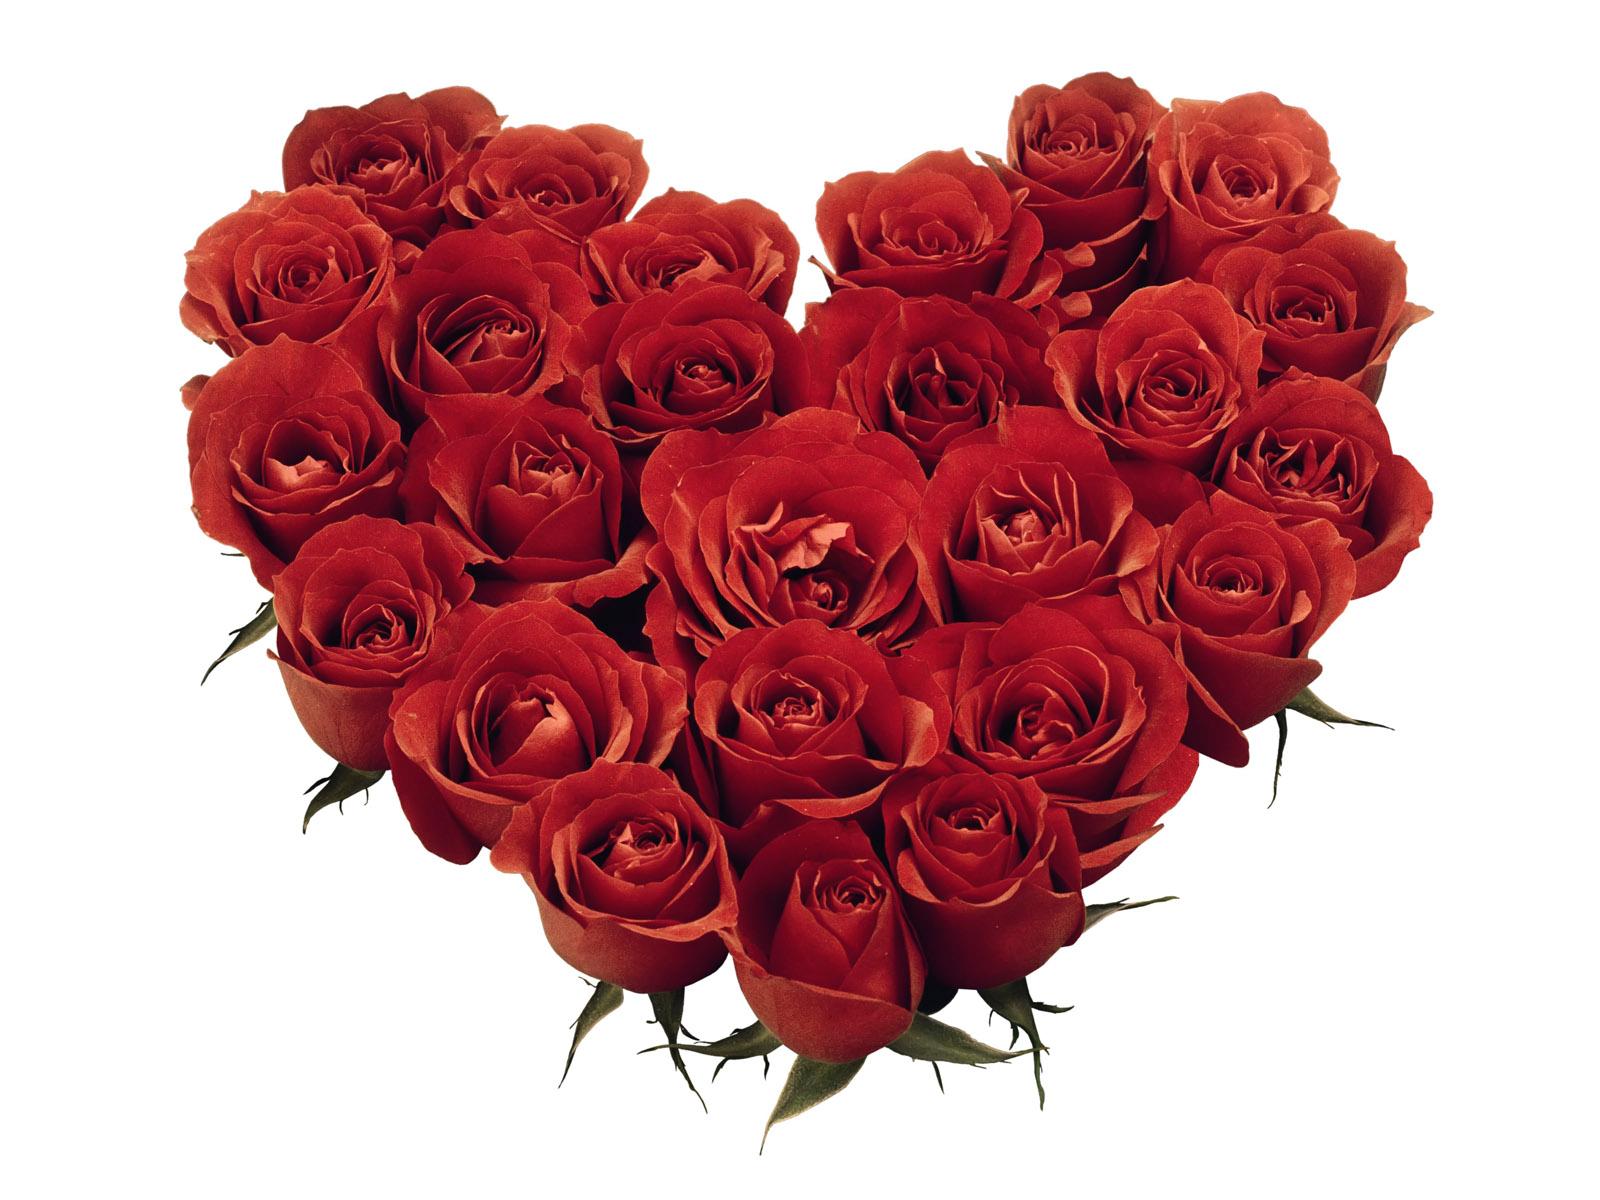 Valentine's Bouquet Roses Clipart.